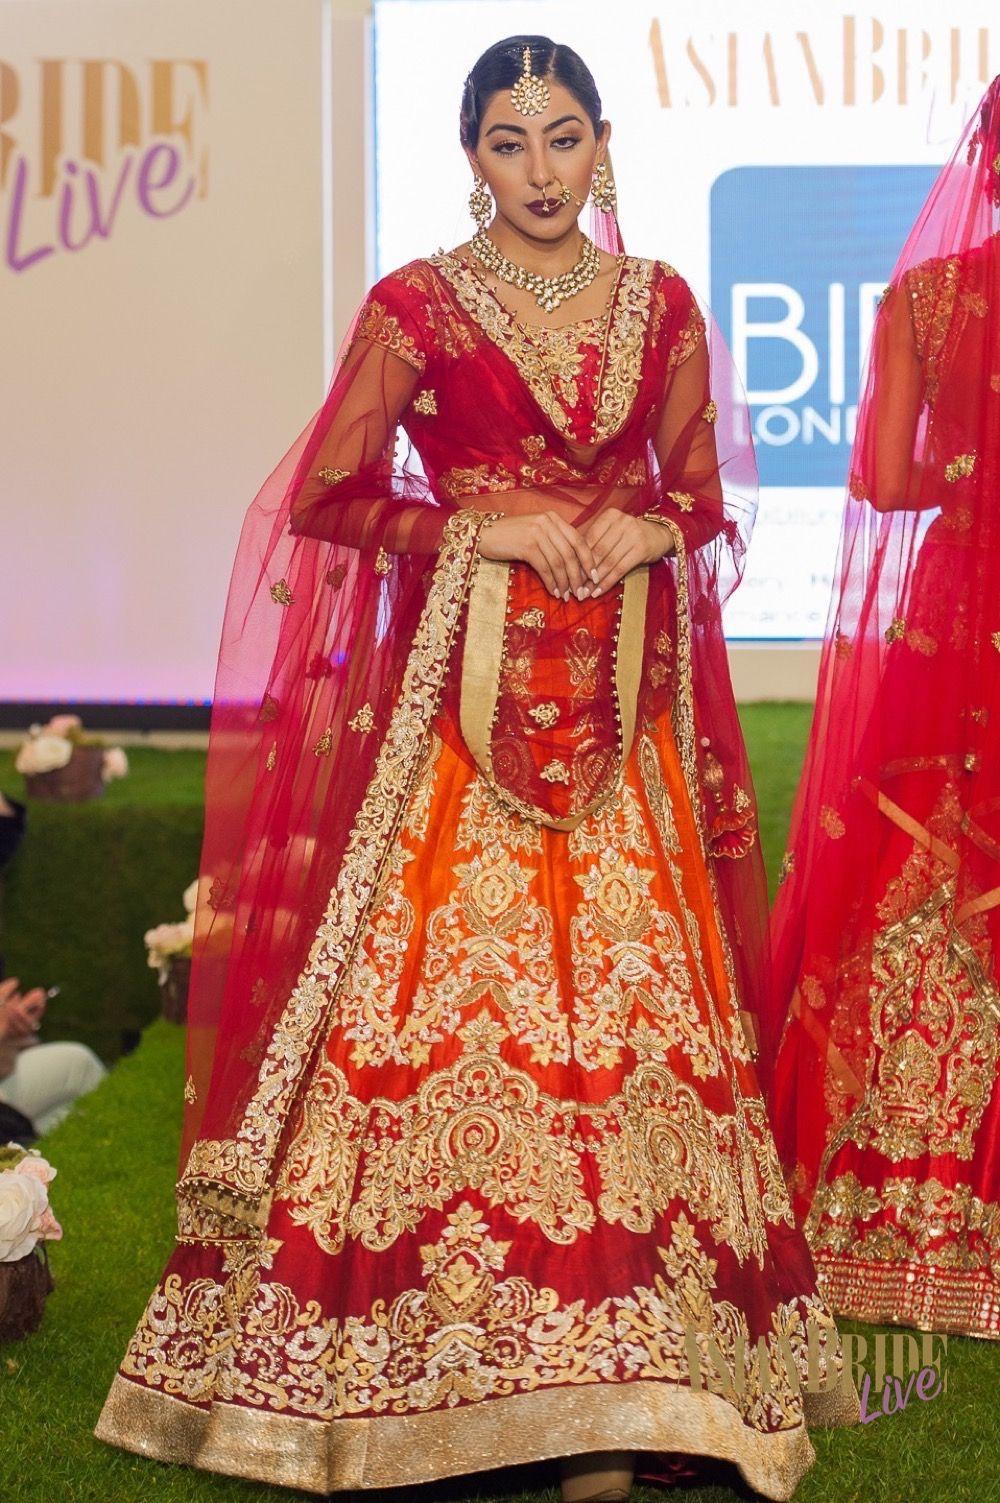 d6310fdbea Red Gold Orange Bibi London Bridal Lengha Bibi London -INDIAN-PAKISTANI- WEDDING-FASHION